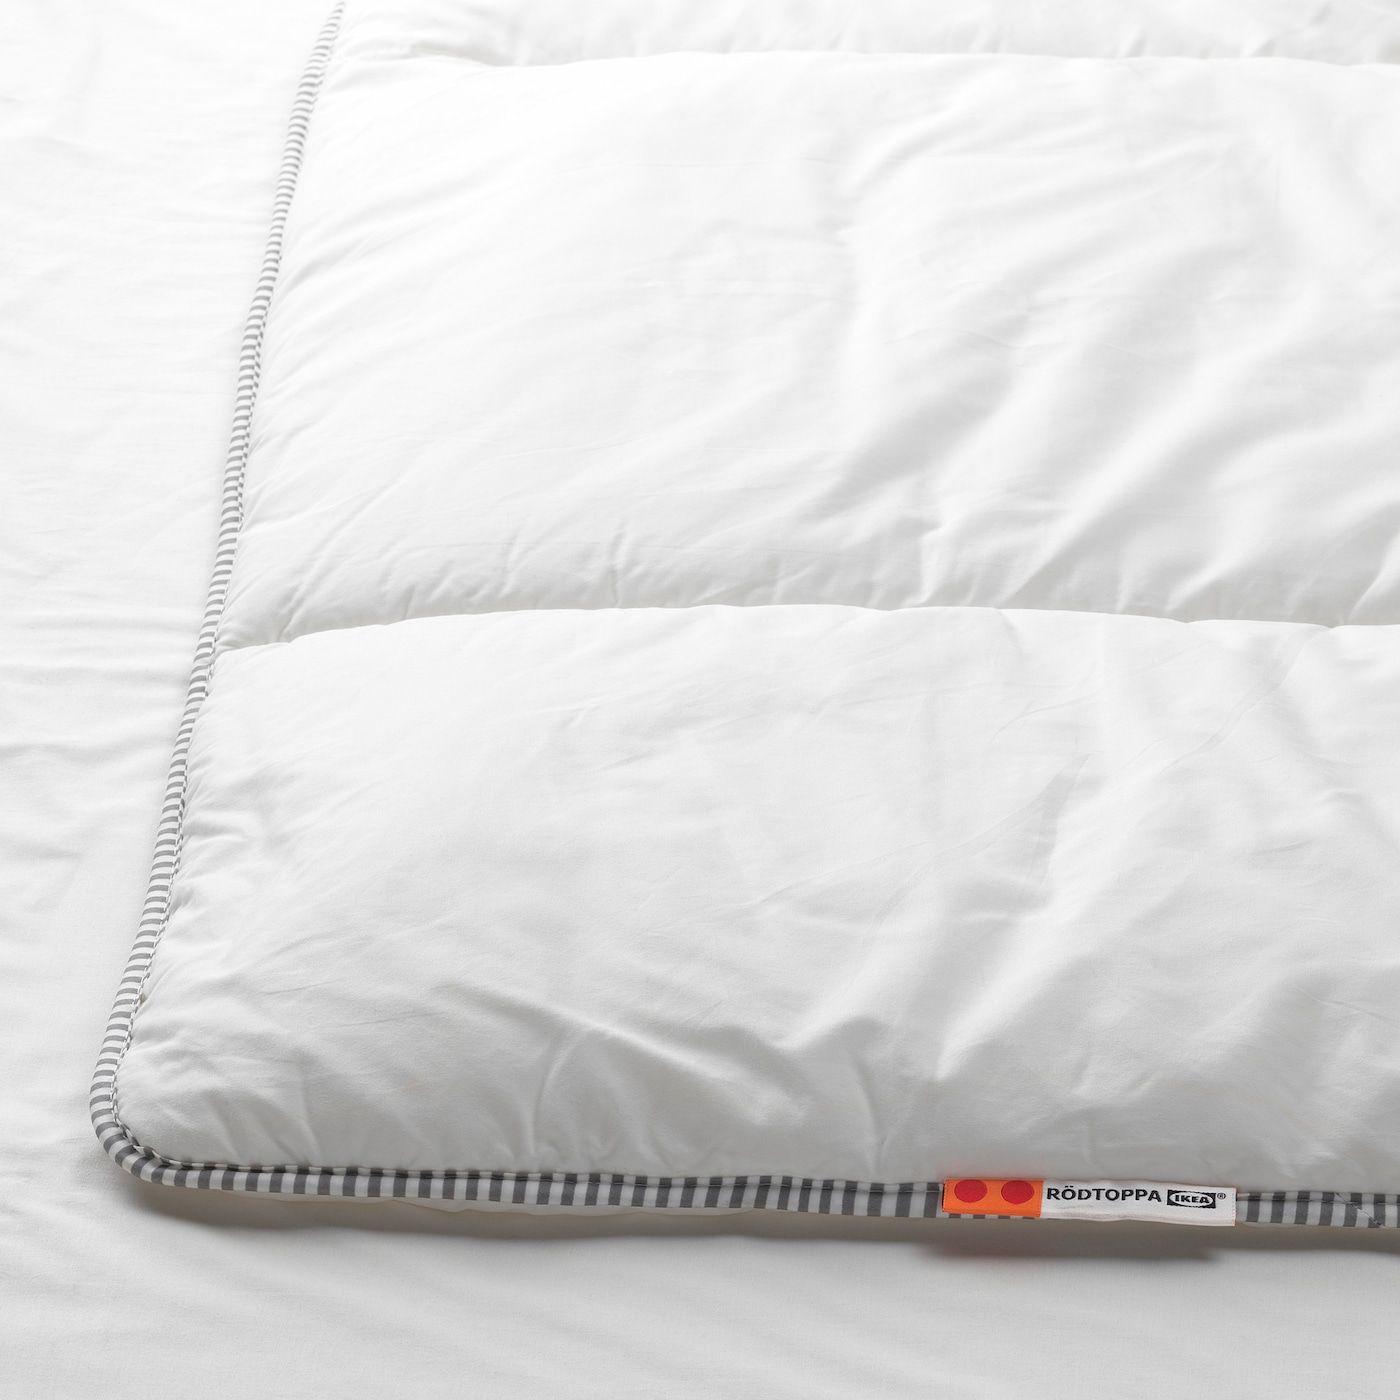 Ikea Rodtoppa Comforter Extra Warm In 2020 Comforters Duvet Ikea